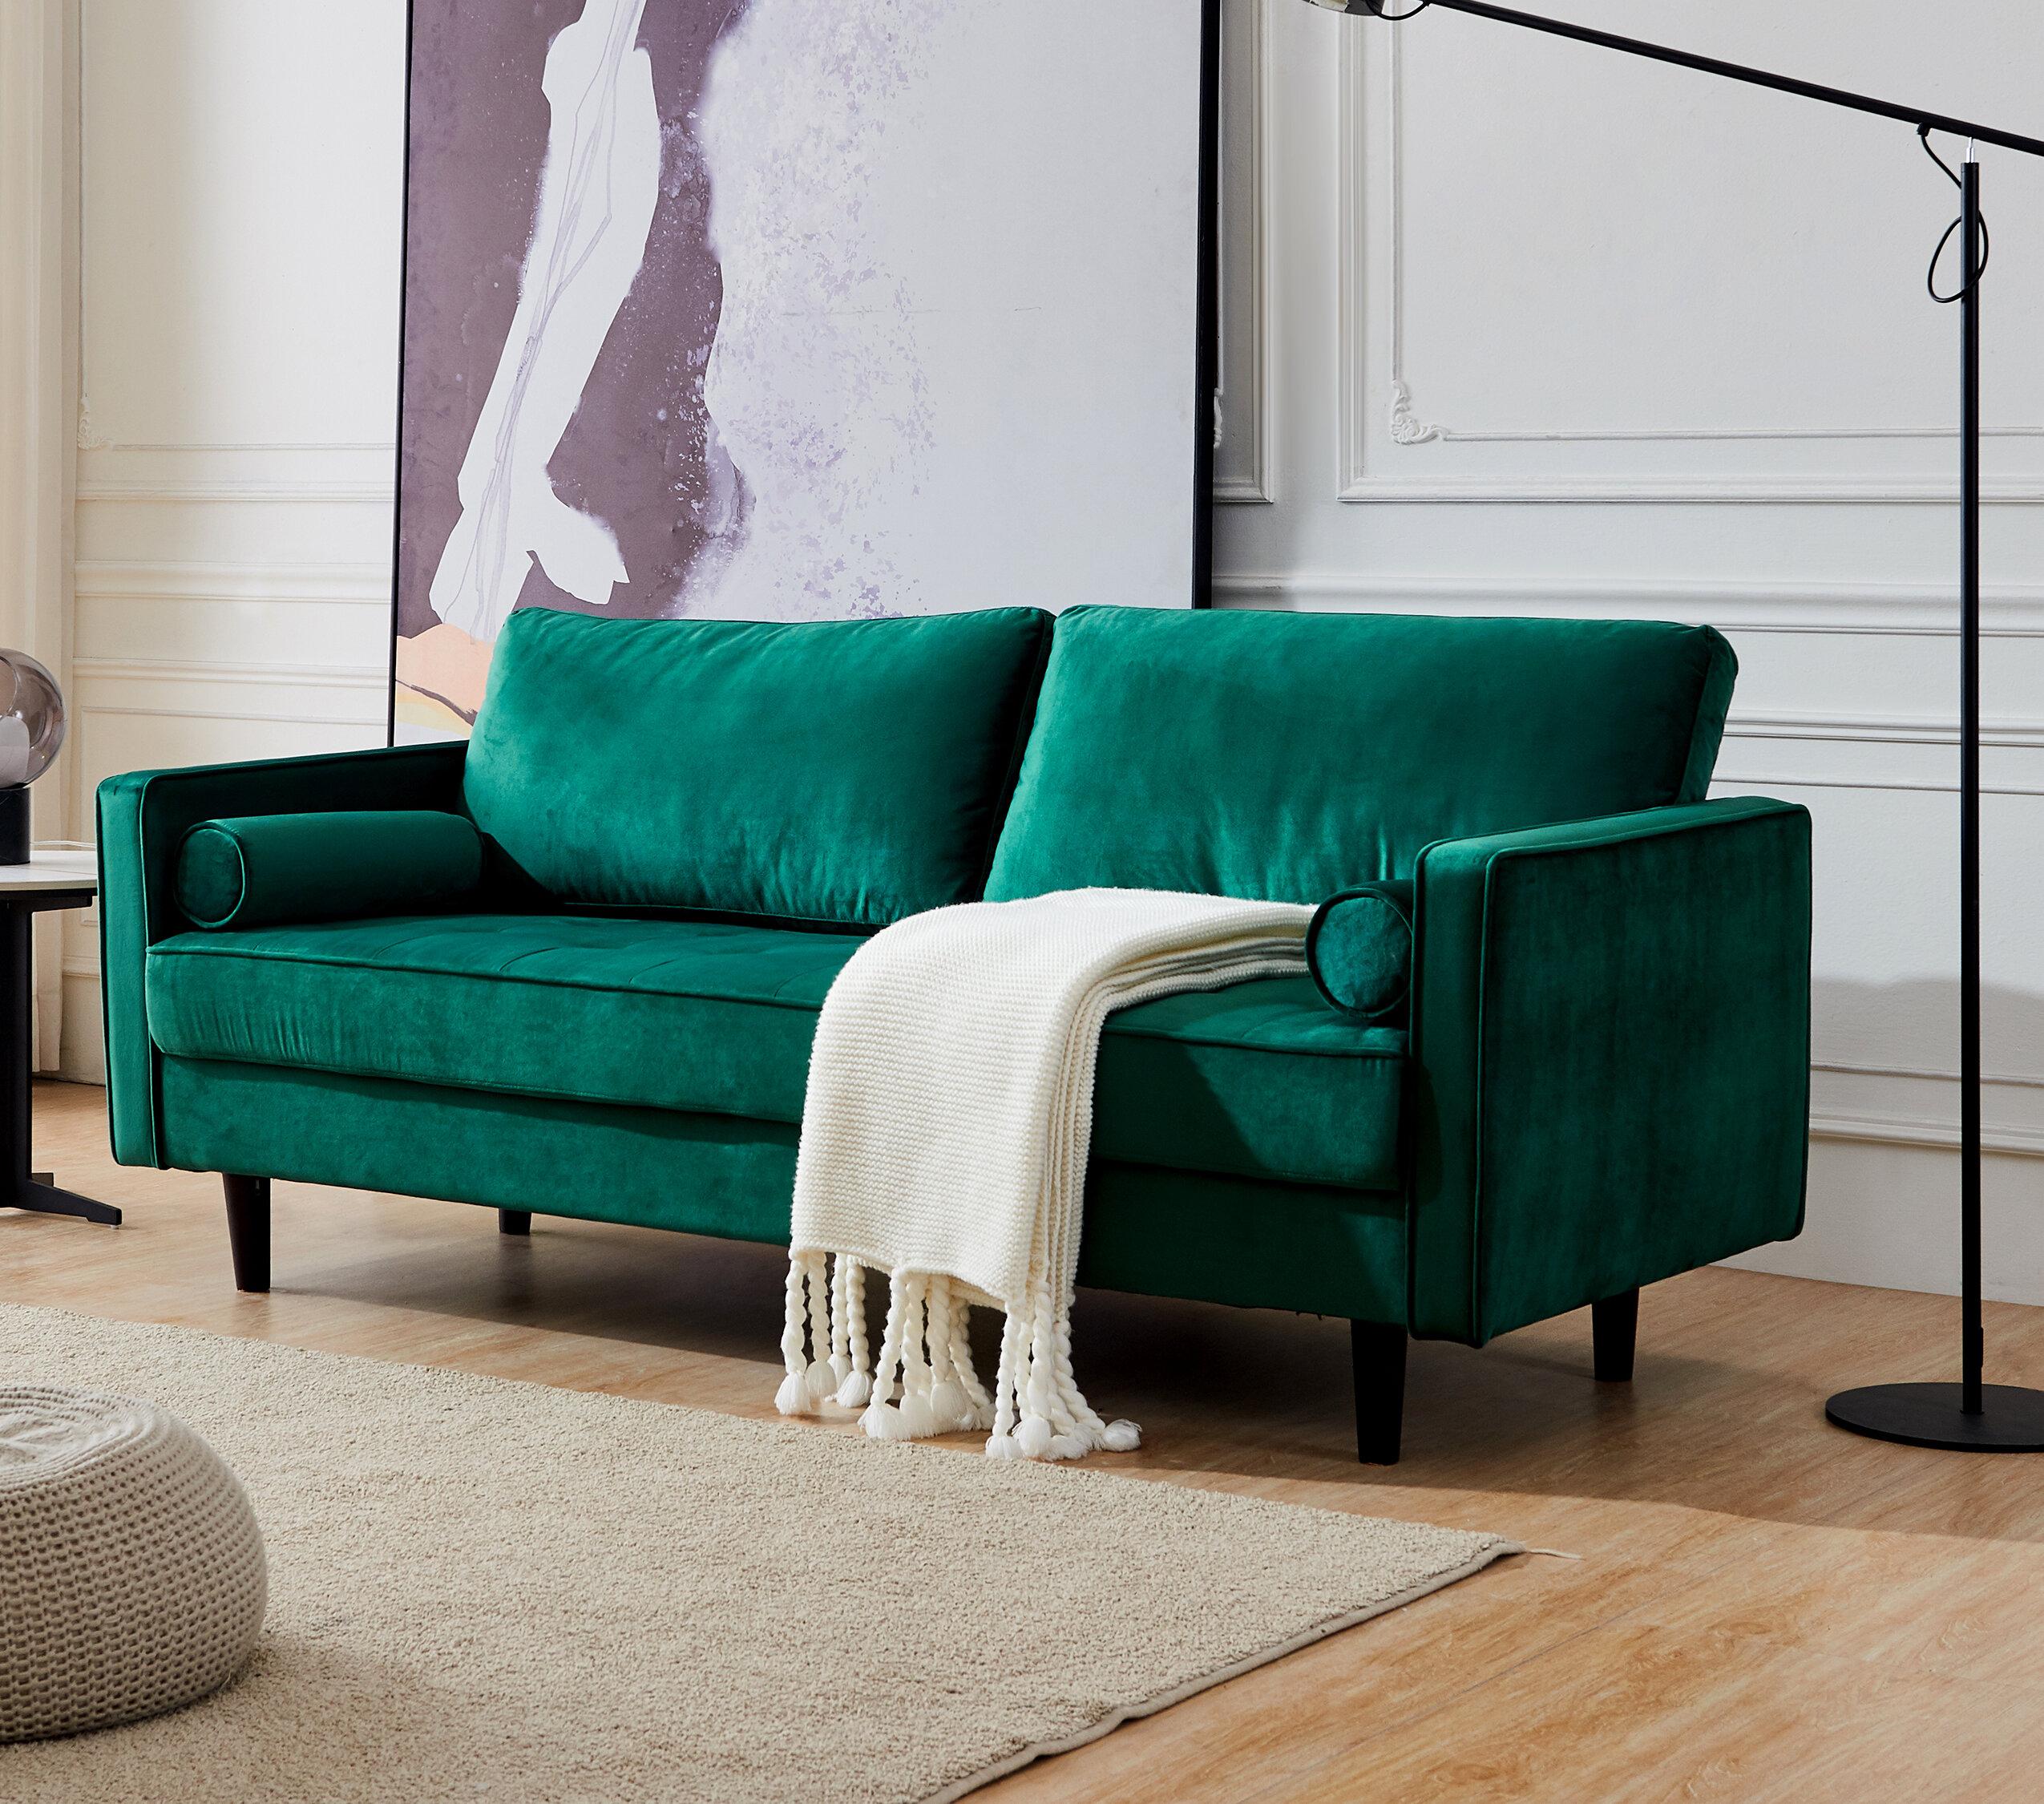 Corrigan Studio Mid Century Modern Velvet Fabric Bench Sectional Couch Sofa 79 W Red Wayfair